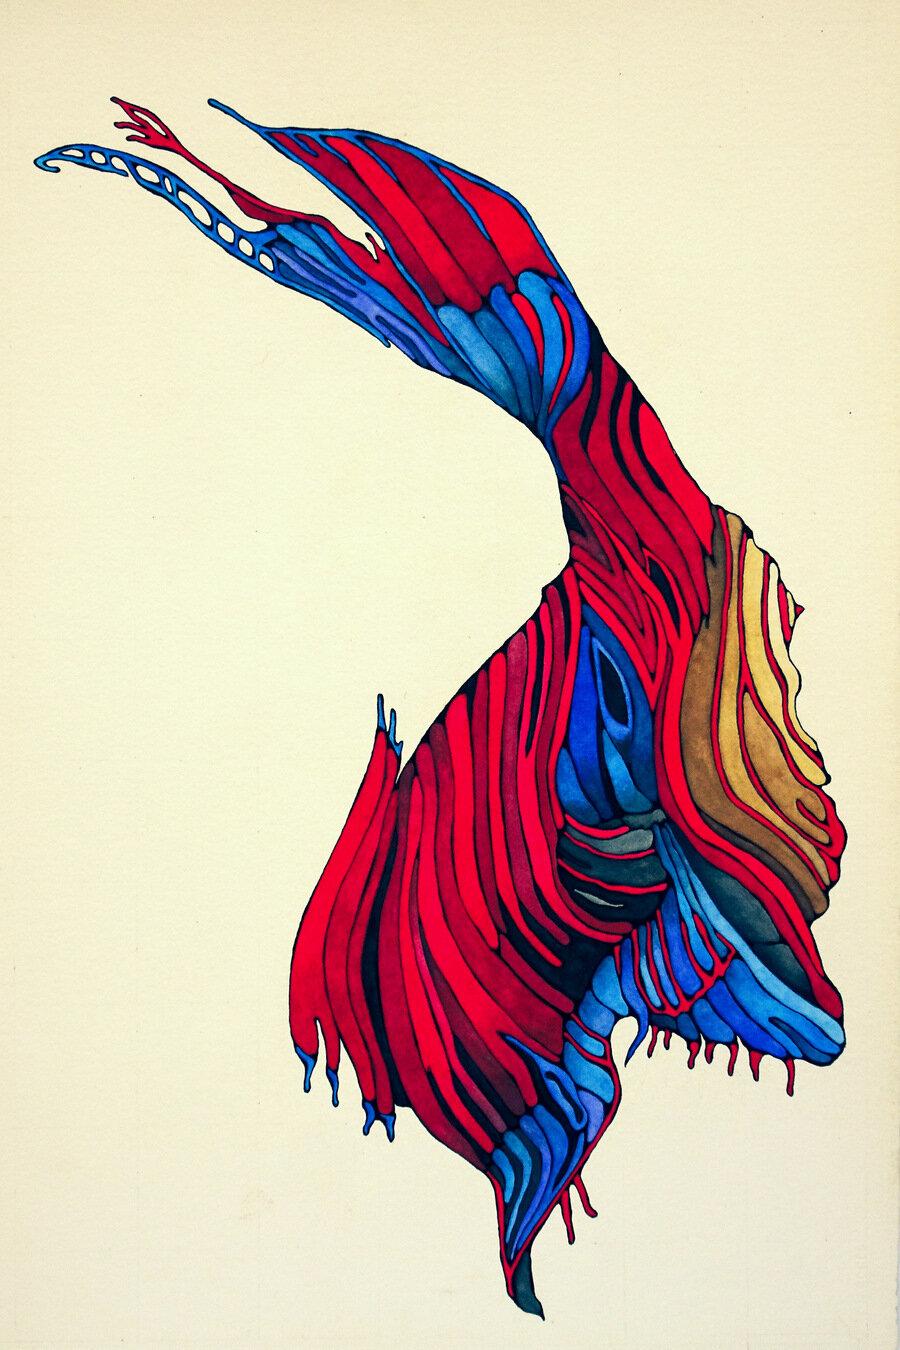 2-Contemporary Landscape Painting, Watercolor-Mixed, Barbara Syburg-002.JPG